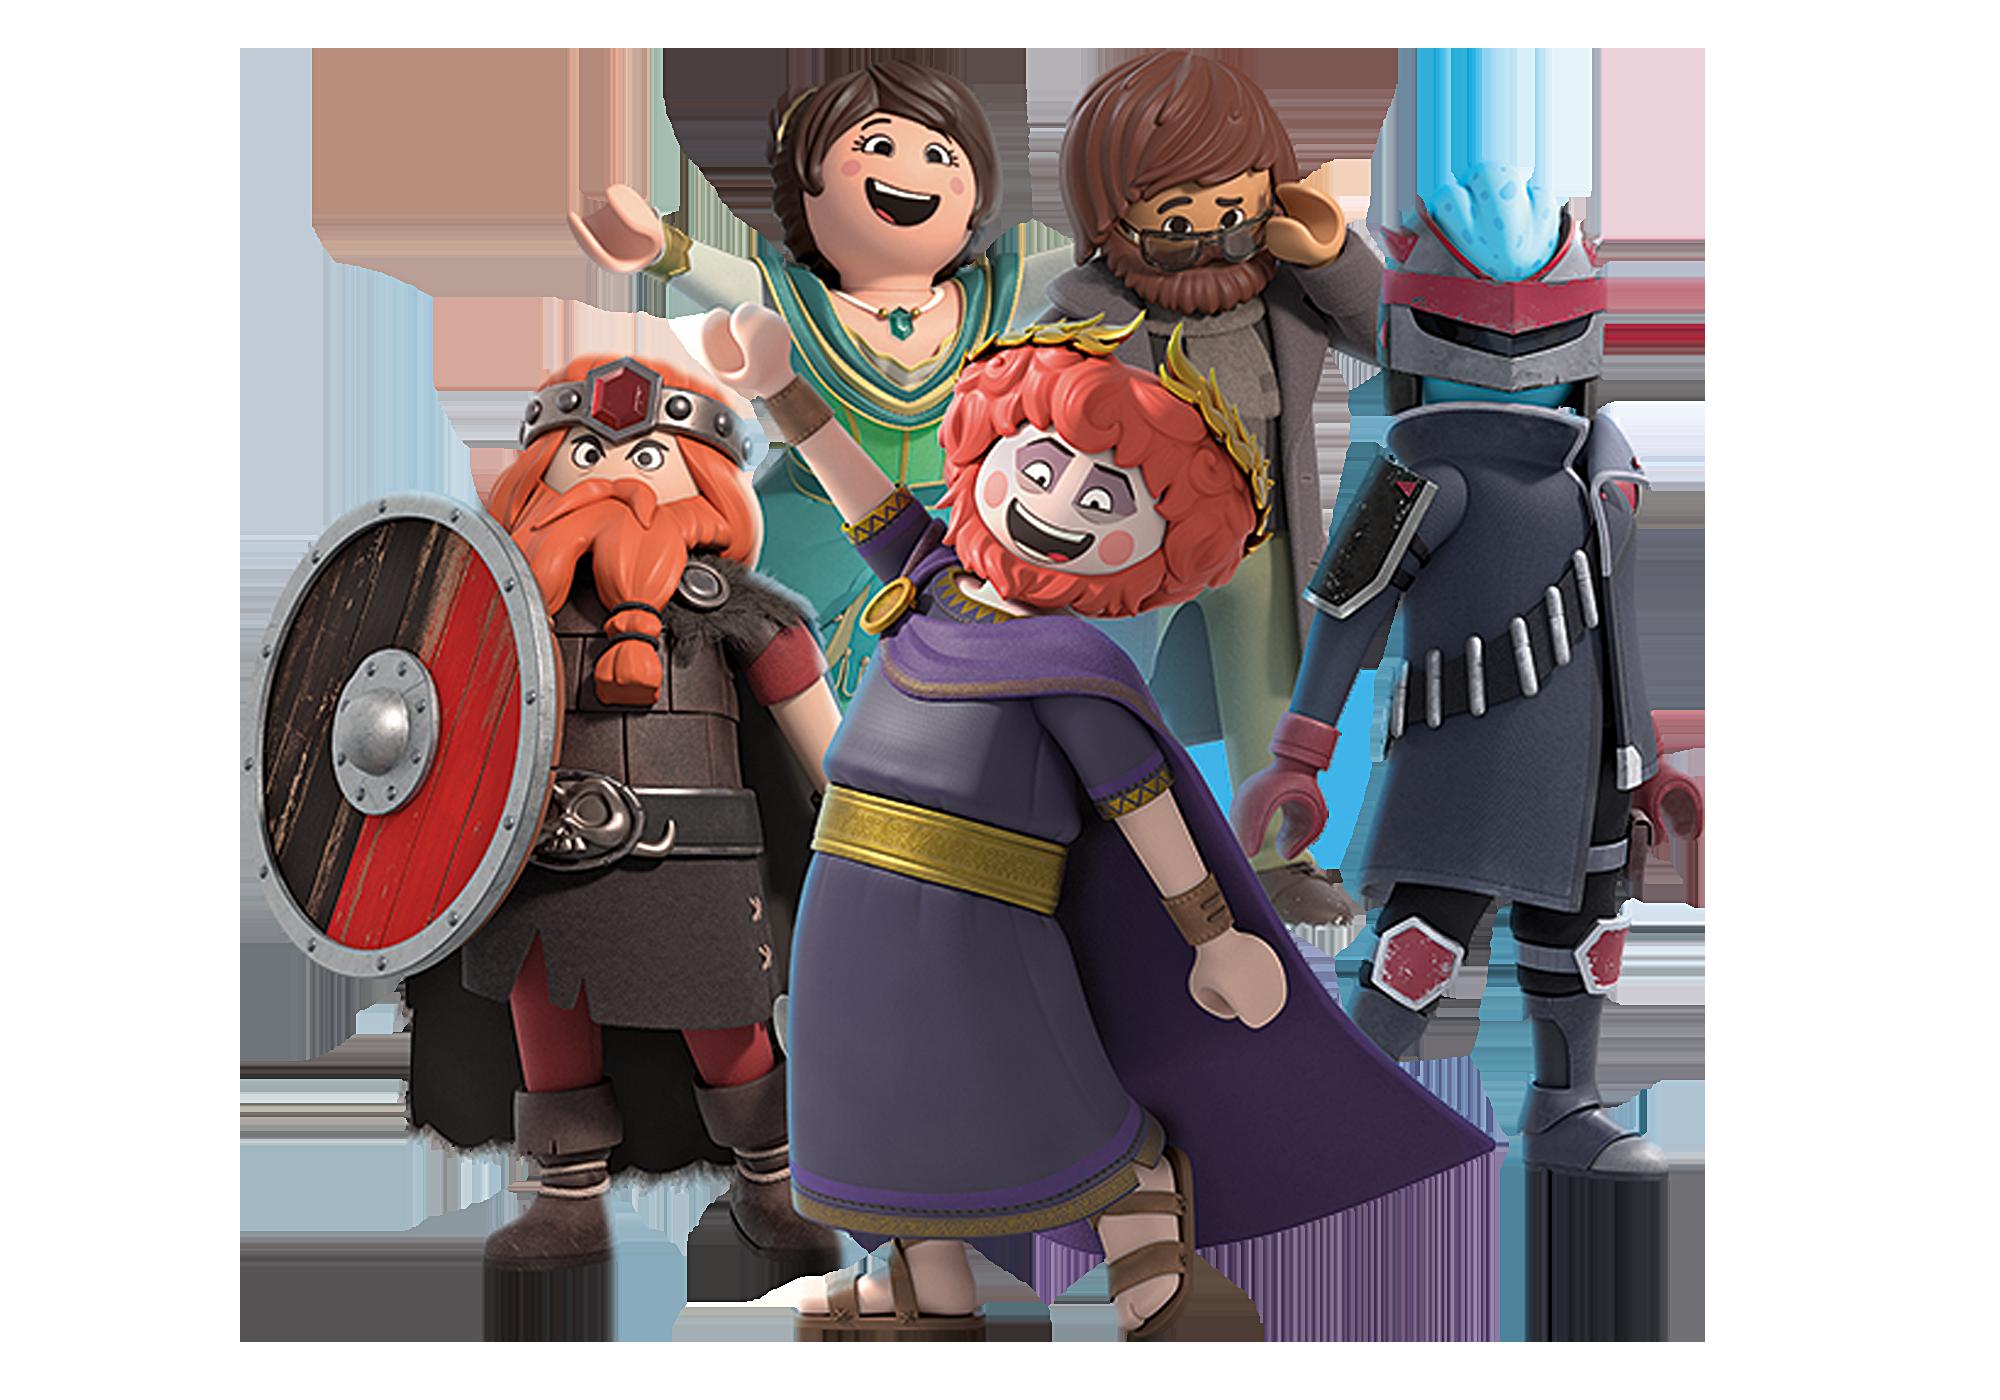 http://media.playmobil.com/i/playmobil/70139_product_detail/PLAYMOBIL:THE MOVIE Figures (Serie 2)